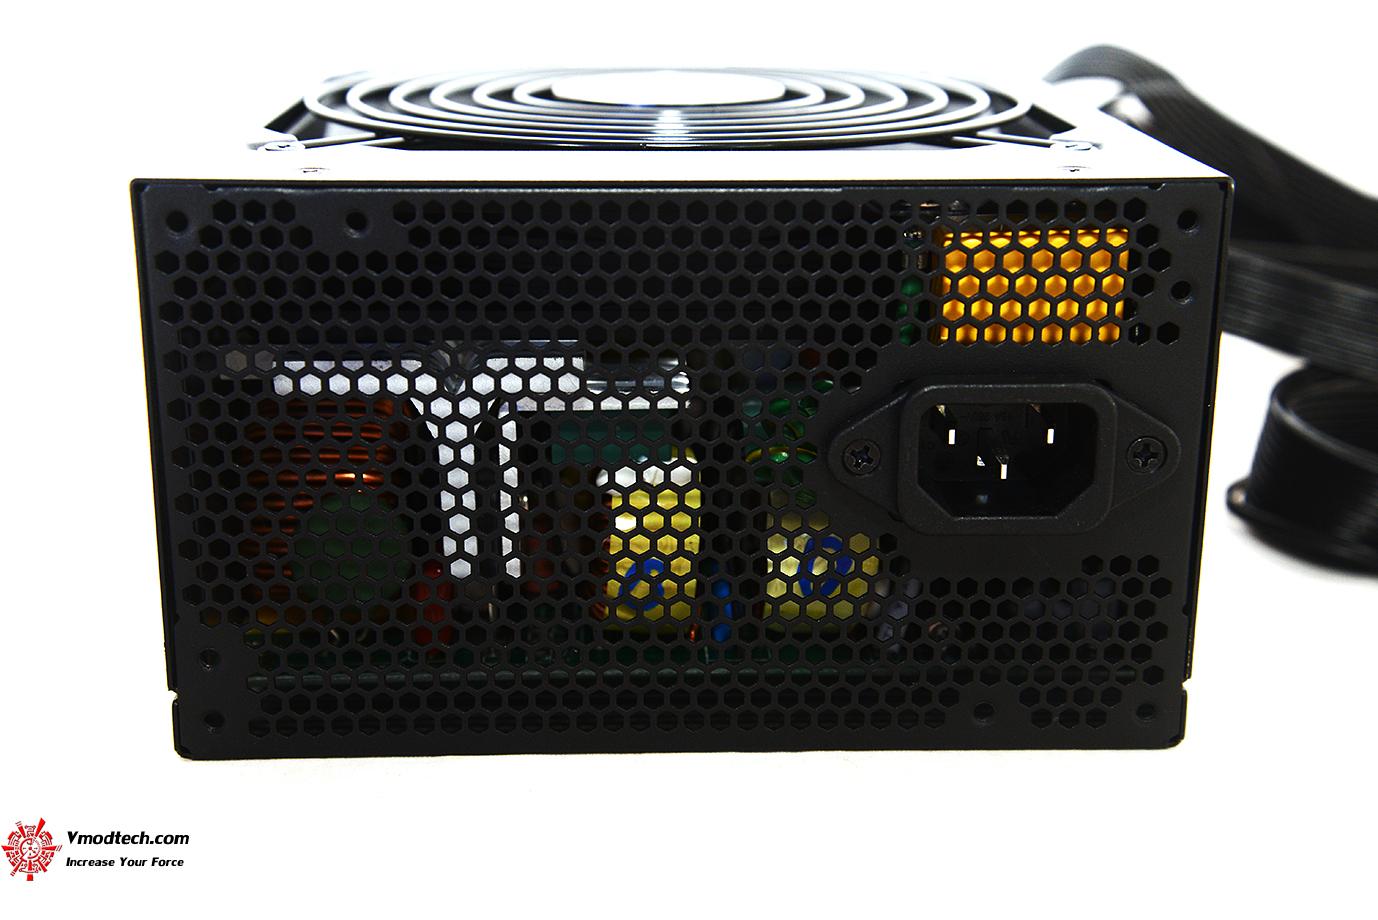 dsc 7017 ENHANCE POWER SUPPLY 1000W EPS 1710 GB1 REVIEW